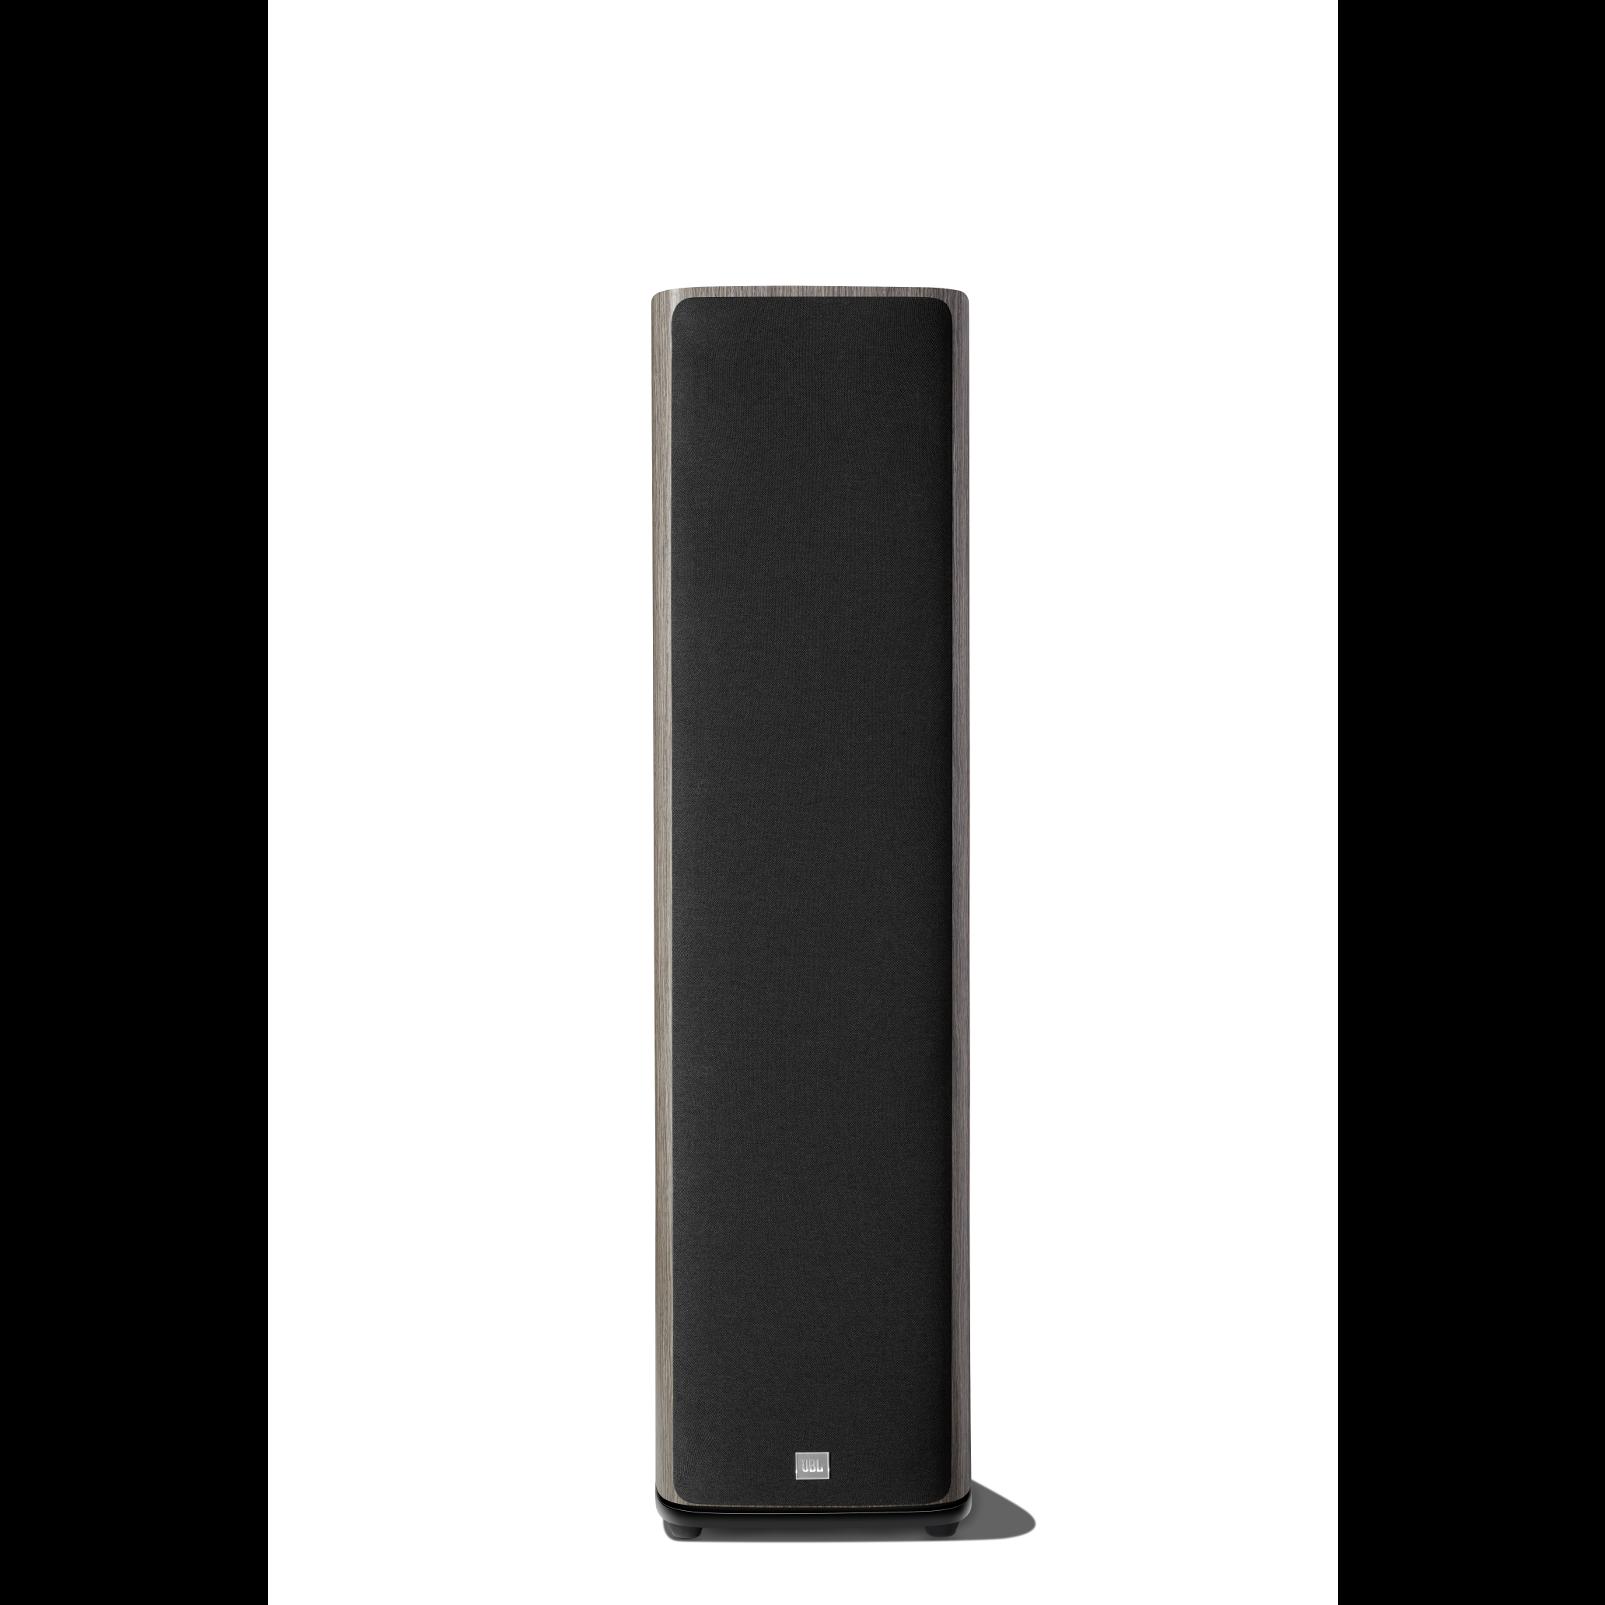 HDI-3800 - Grey Oak - 2 ½-way Triple 8-inch (200mm) Floorstanding Loudspeaker - Front